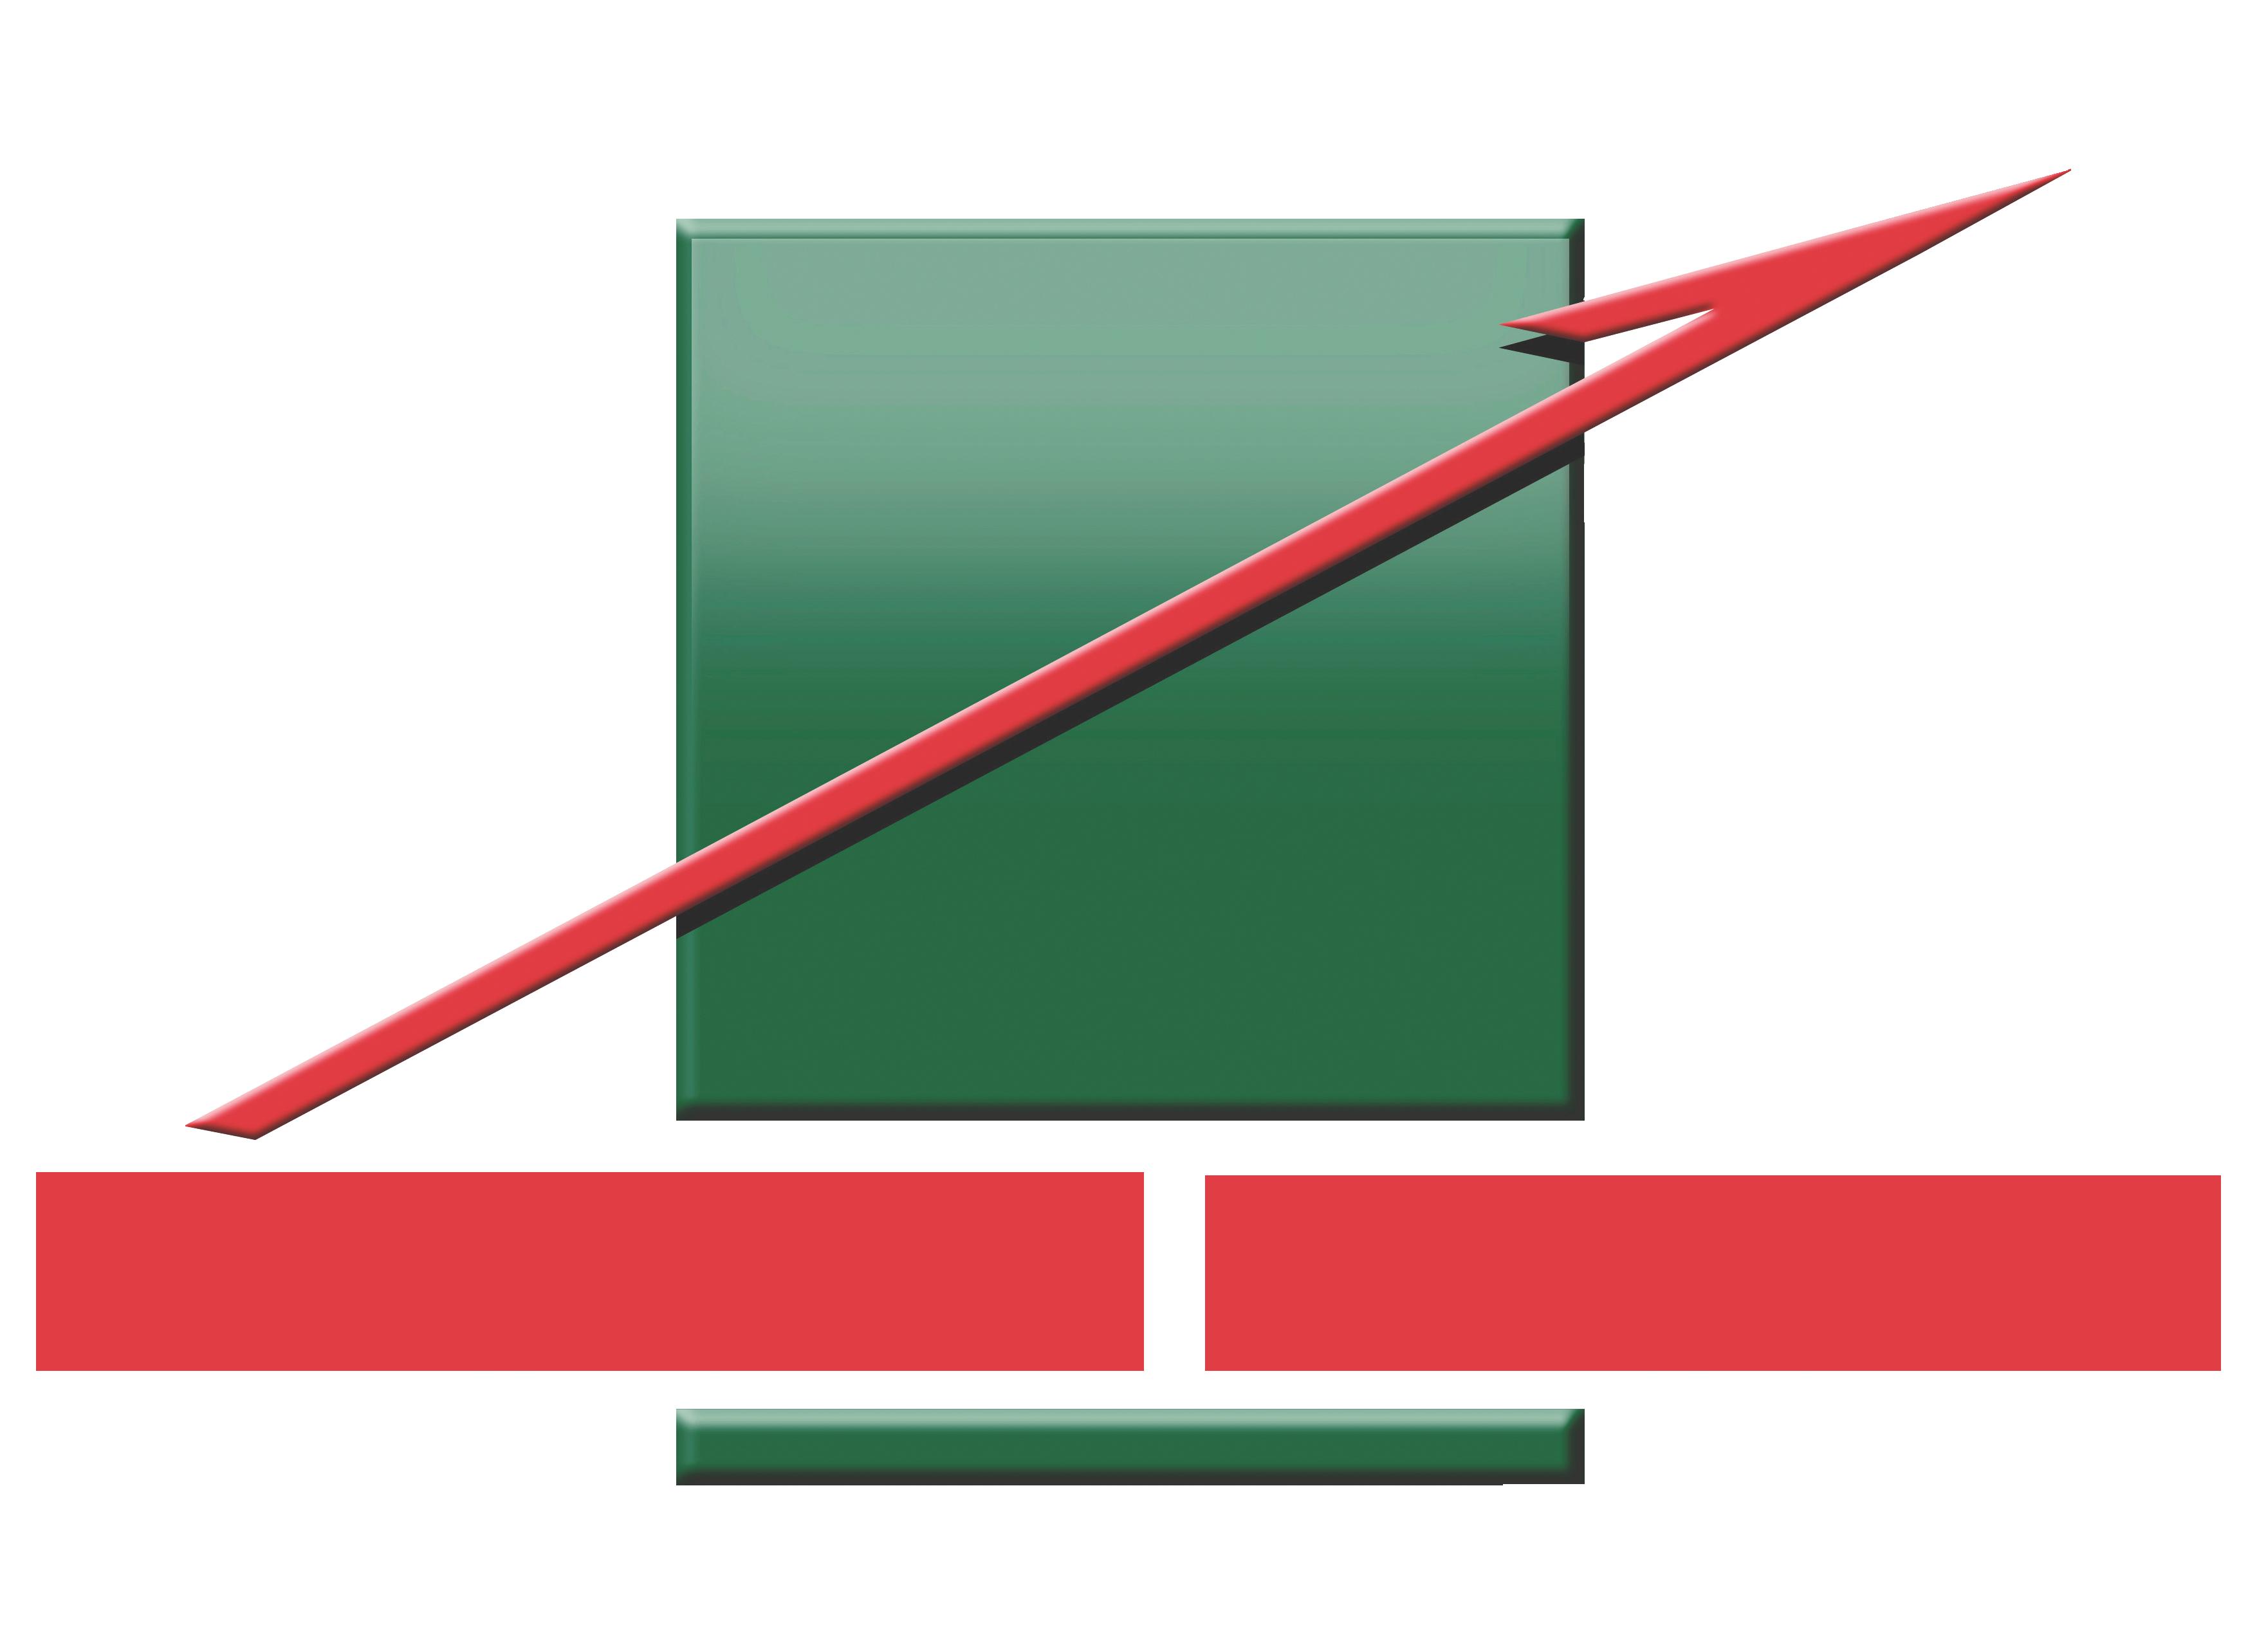 groupe_maurin_logo_detoure